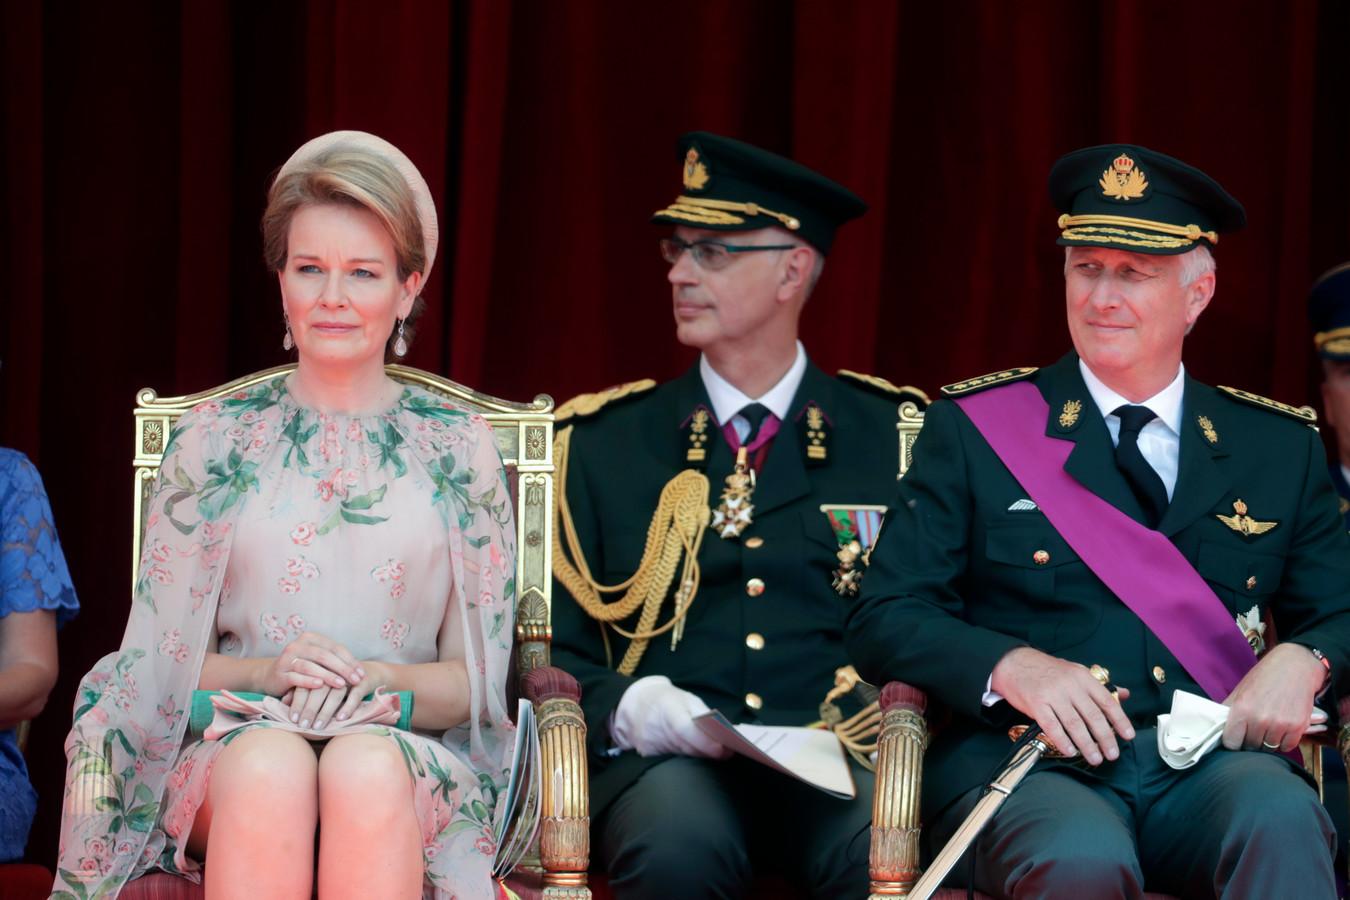 Le roi Philippe et la reine Mathilde.